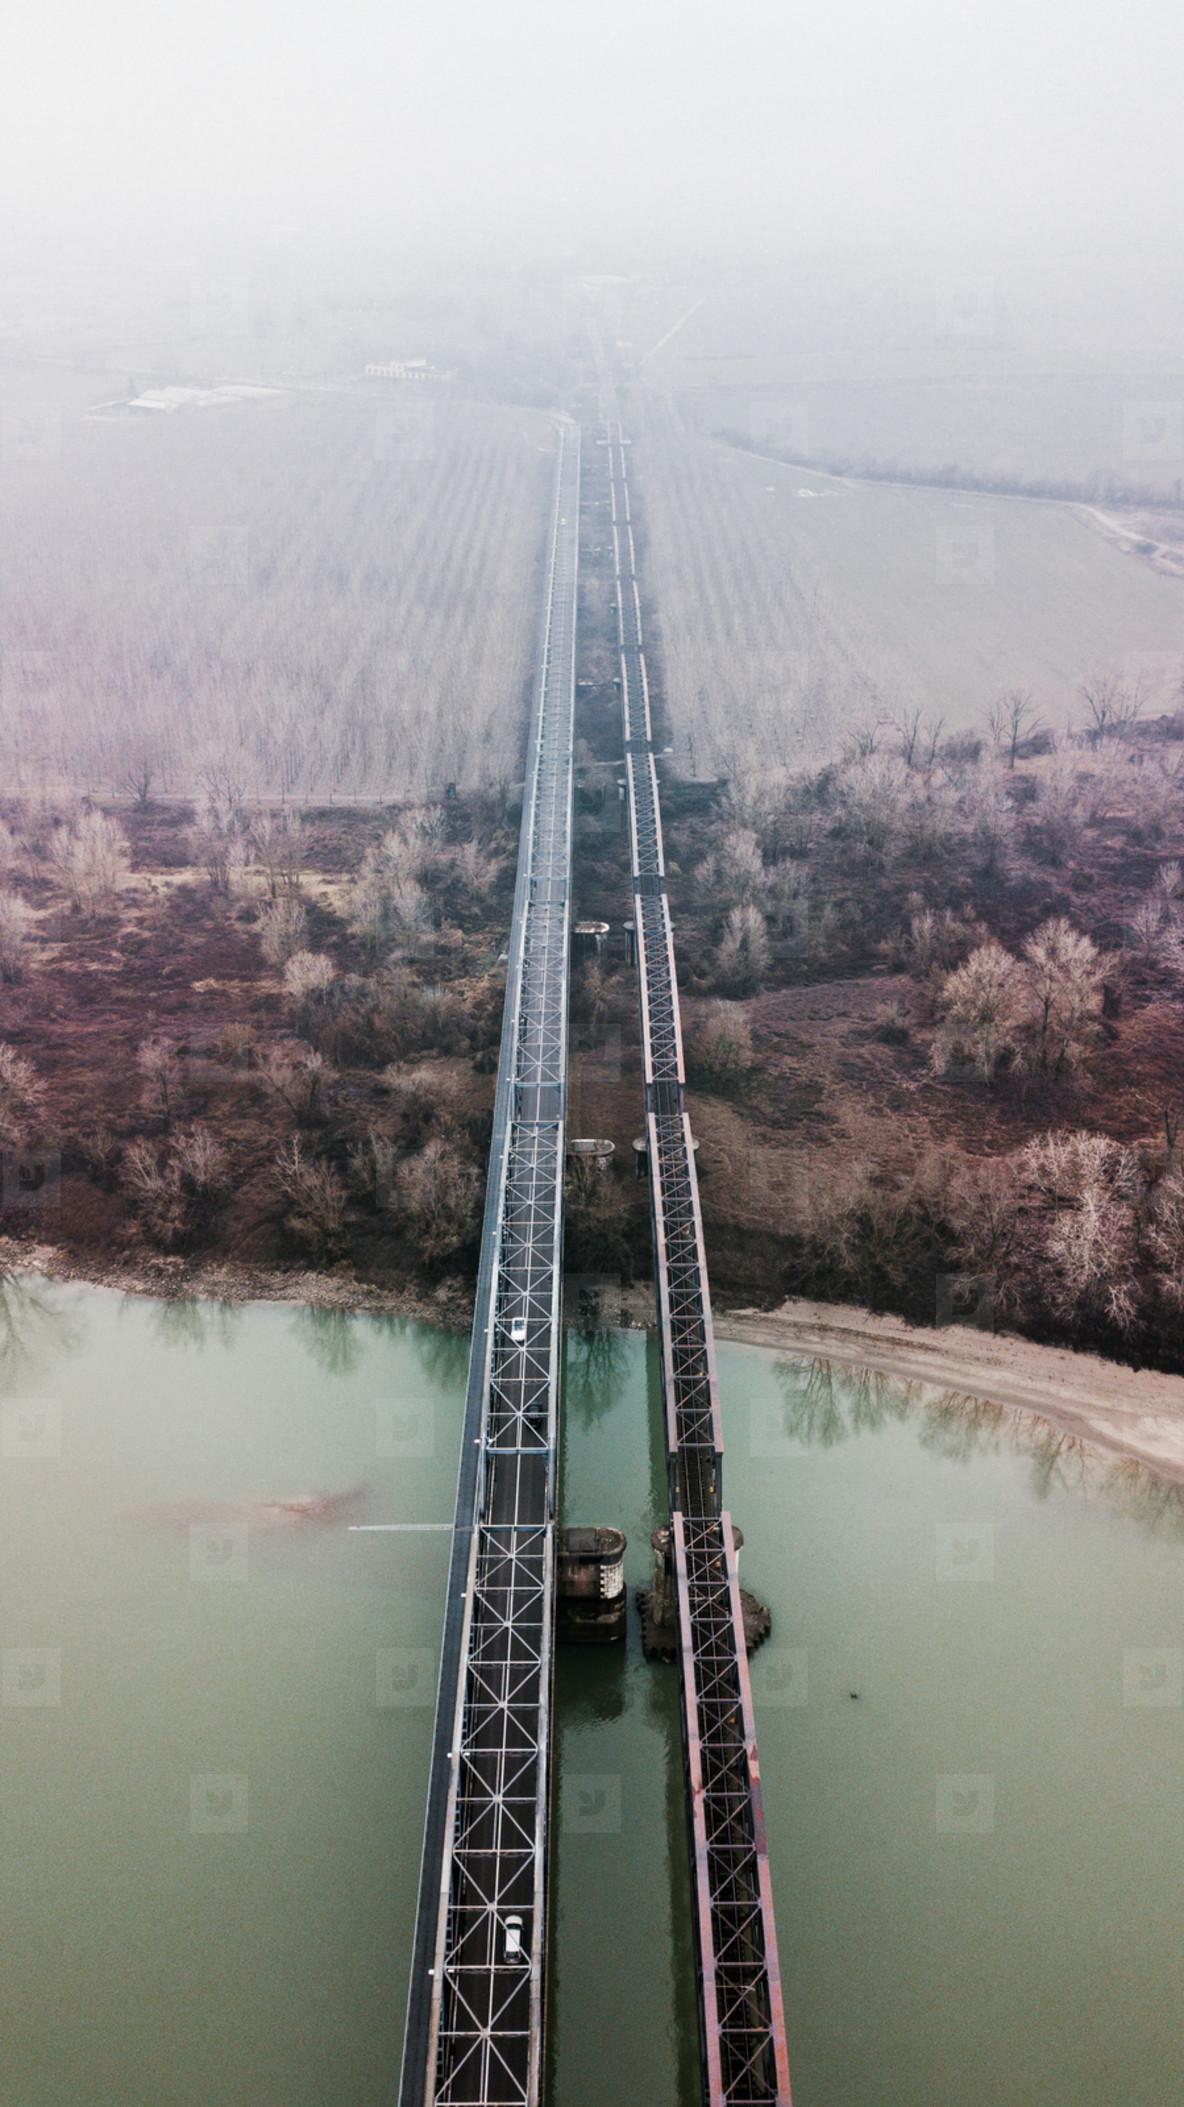 Aerial view of a bridge